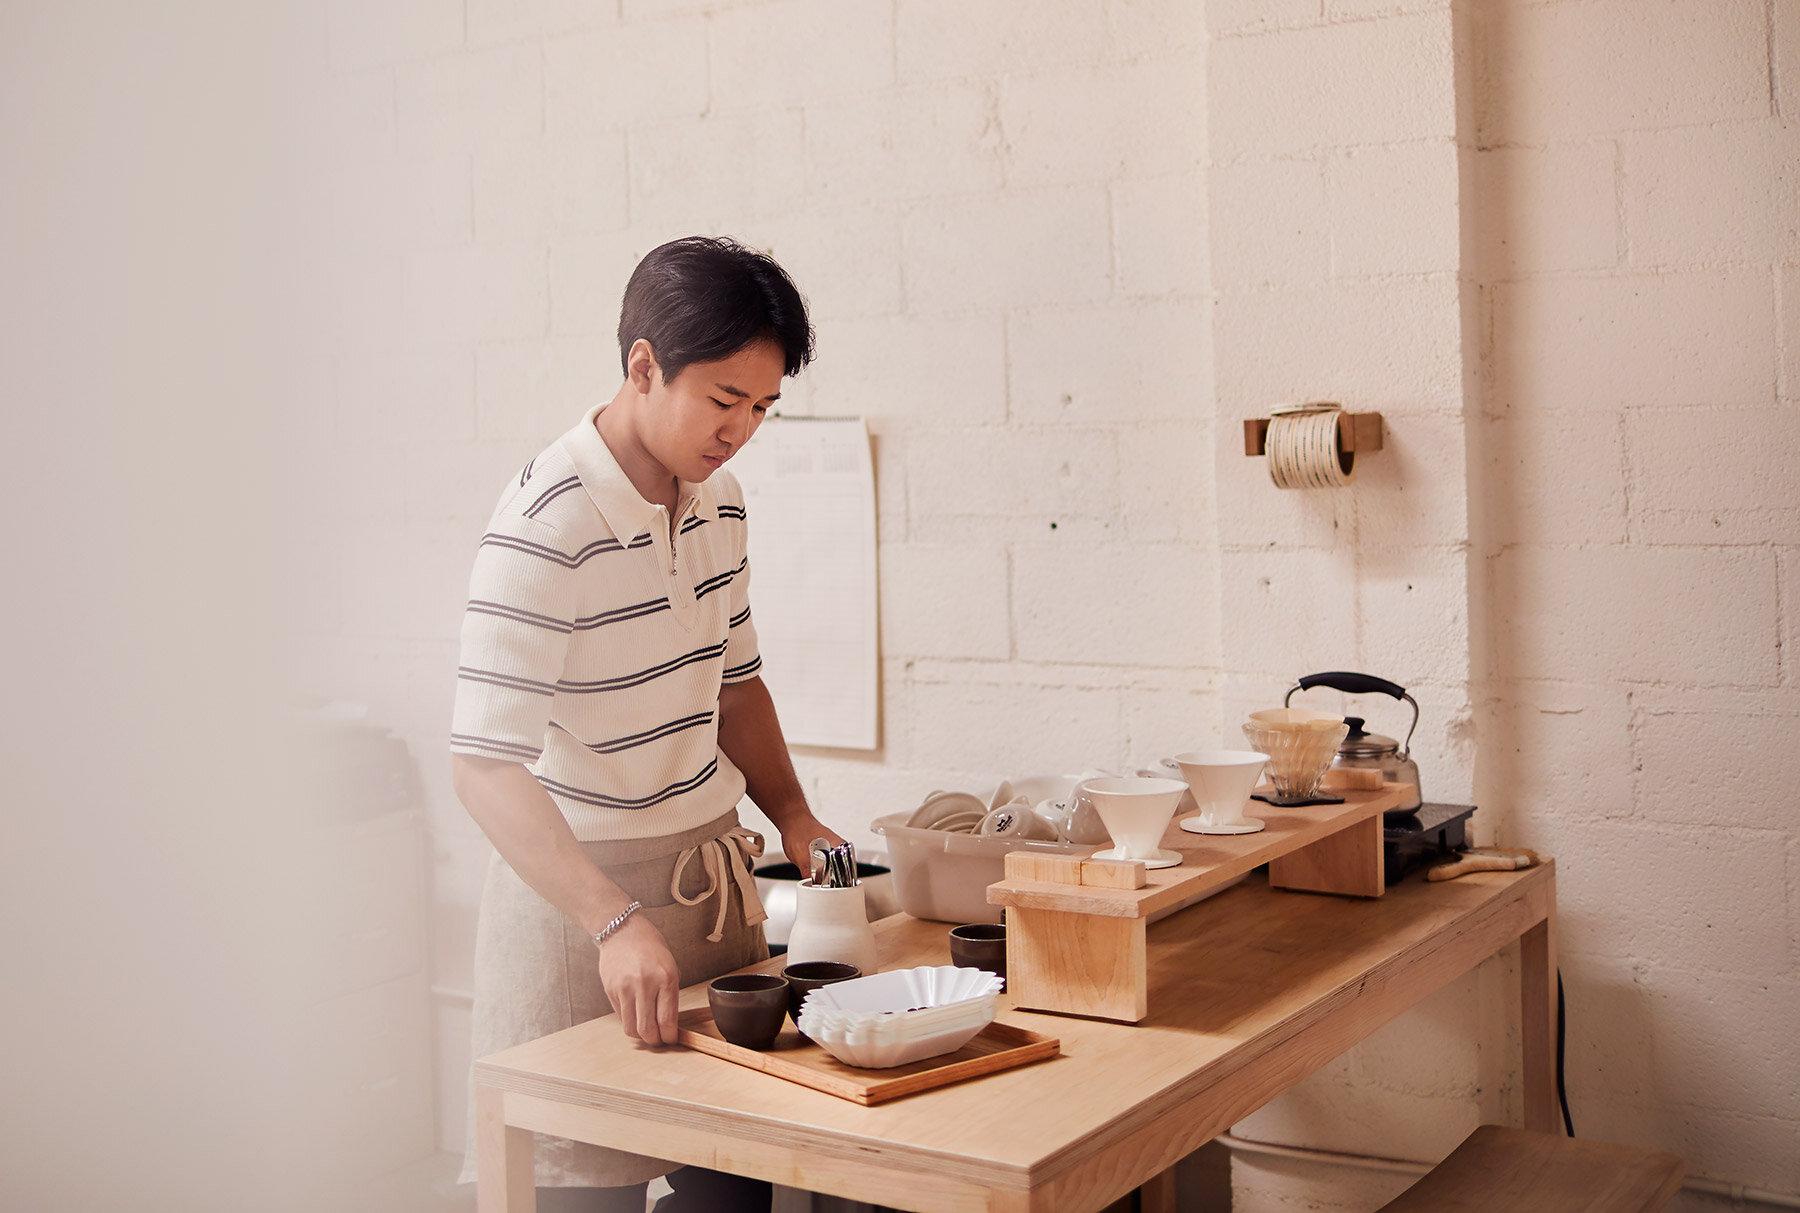 jocob-preparing-coffee-tasting.jpg